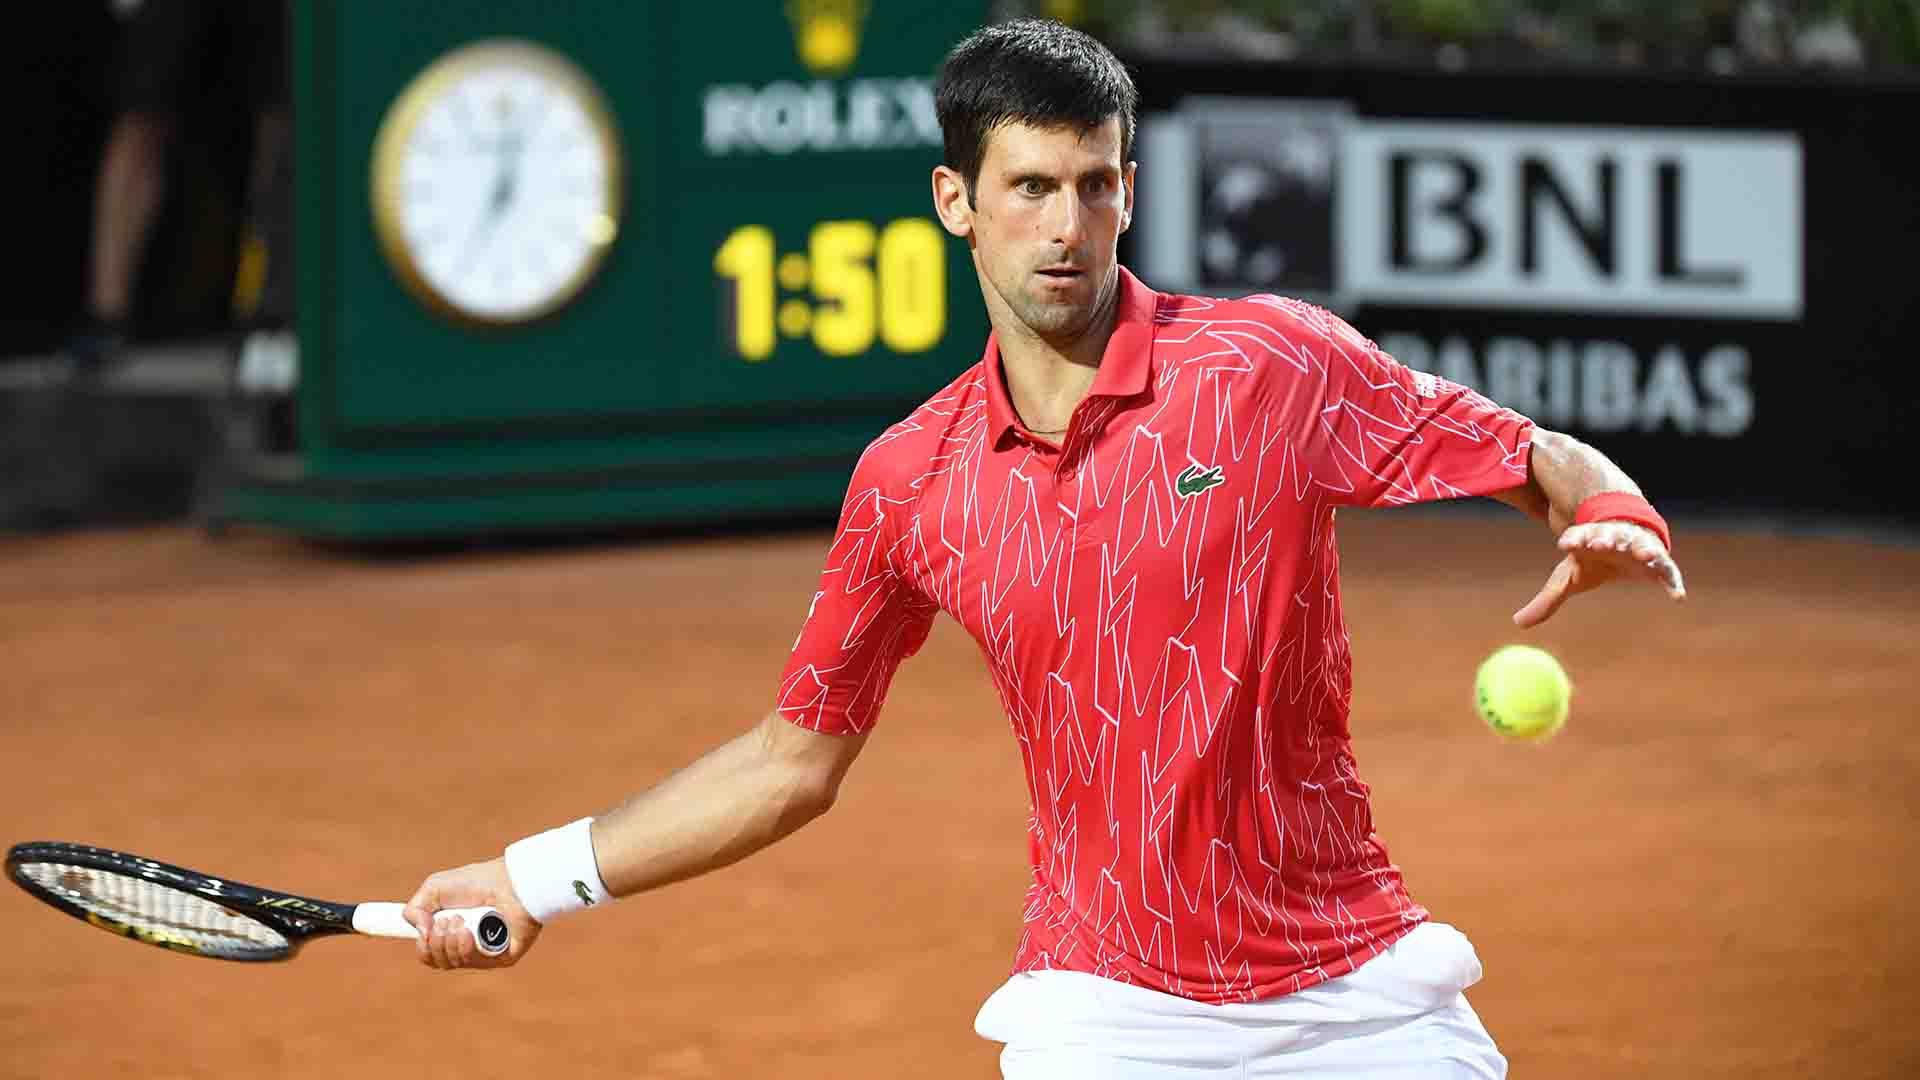 Rome Open 2021: Novak Djokovic vs. Taylor Fritz Tennis Pick and Prediction